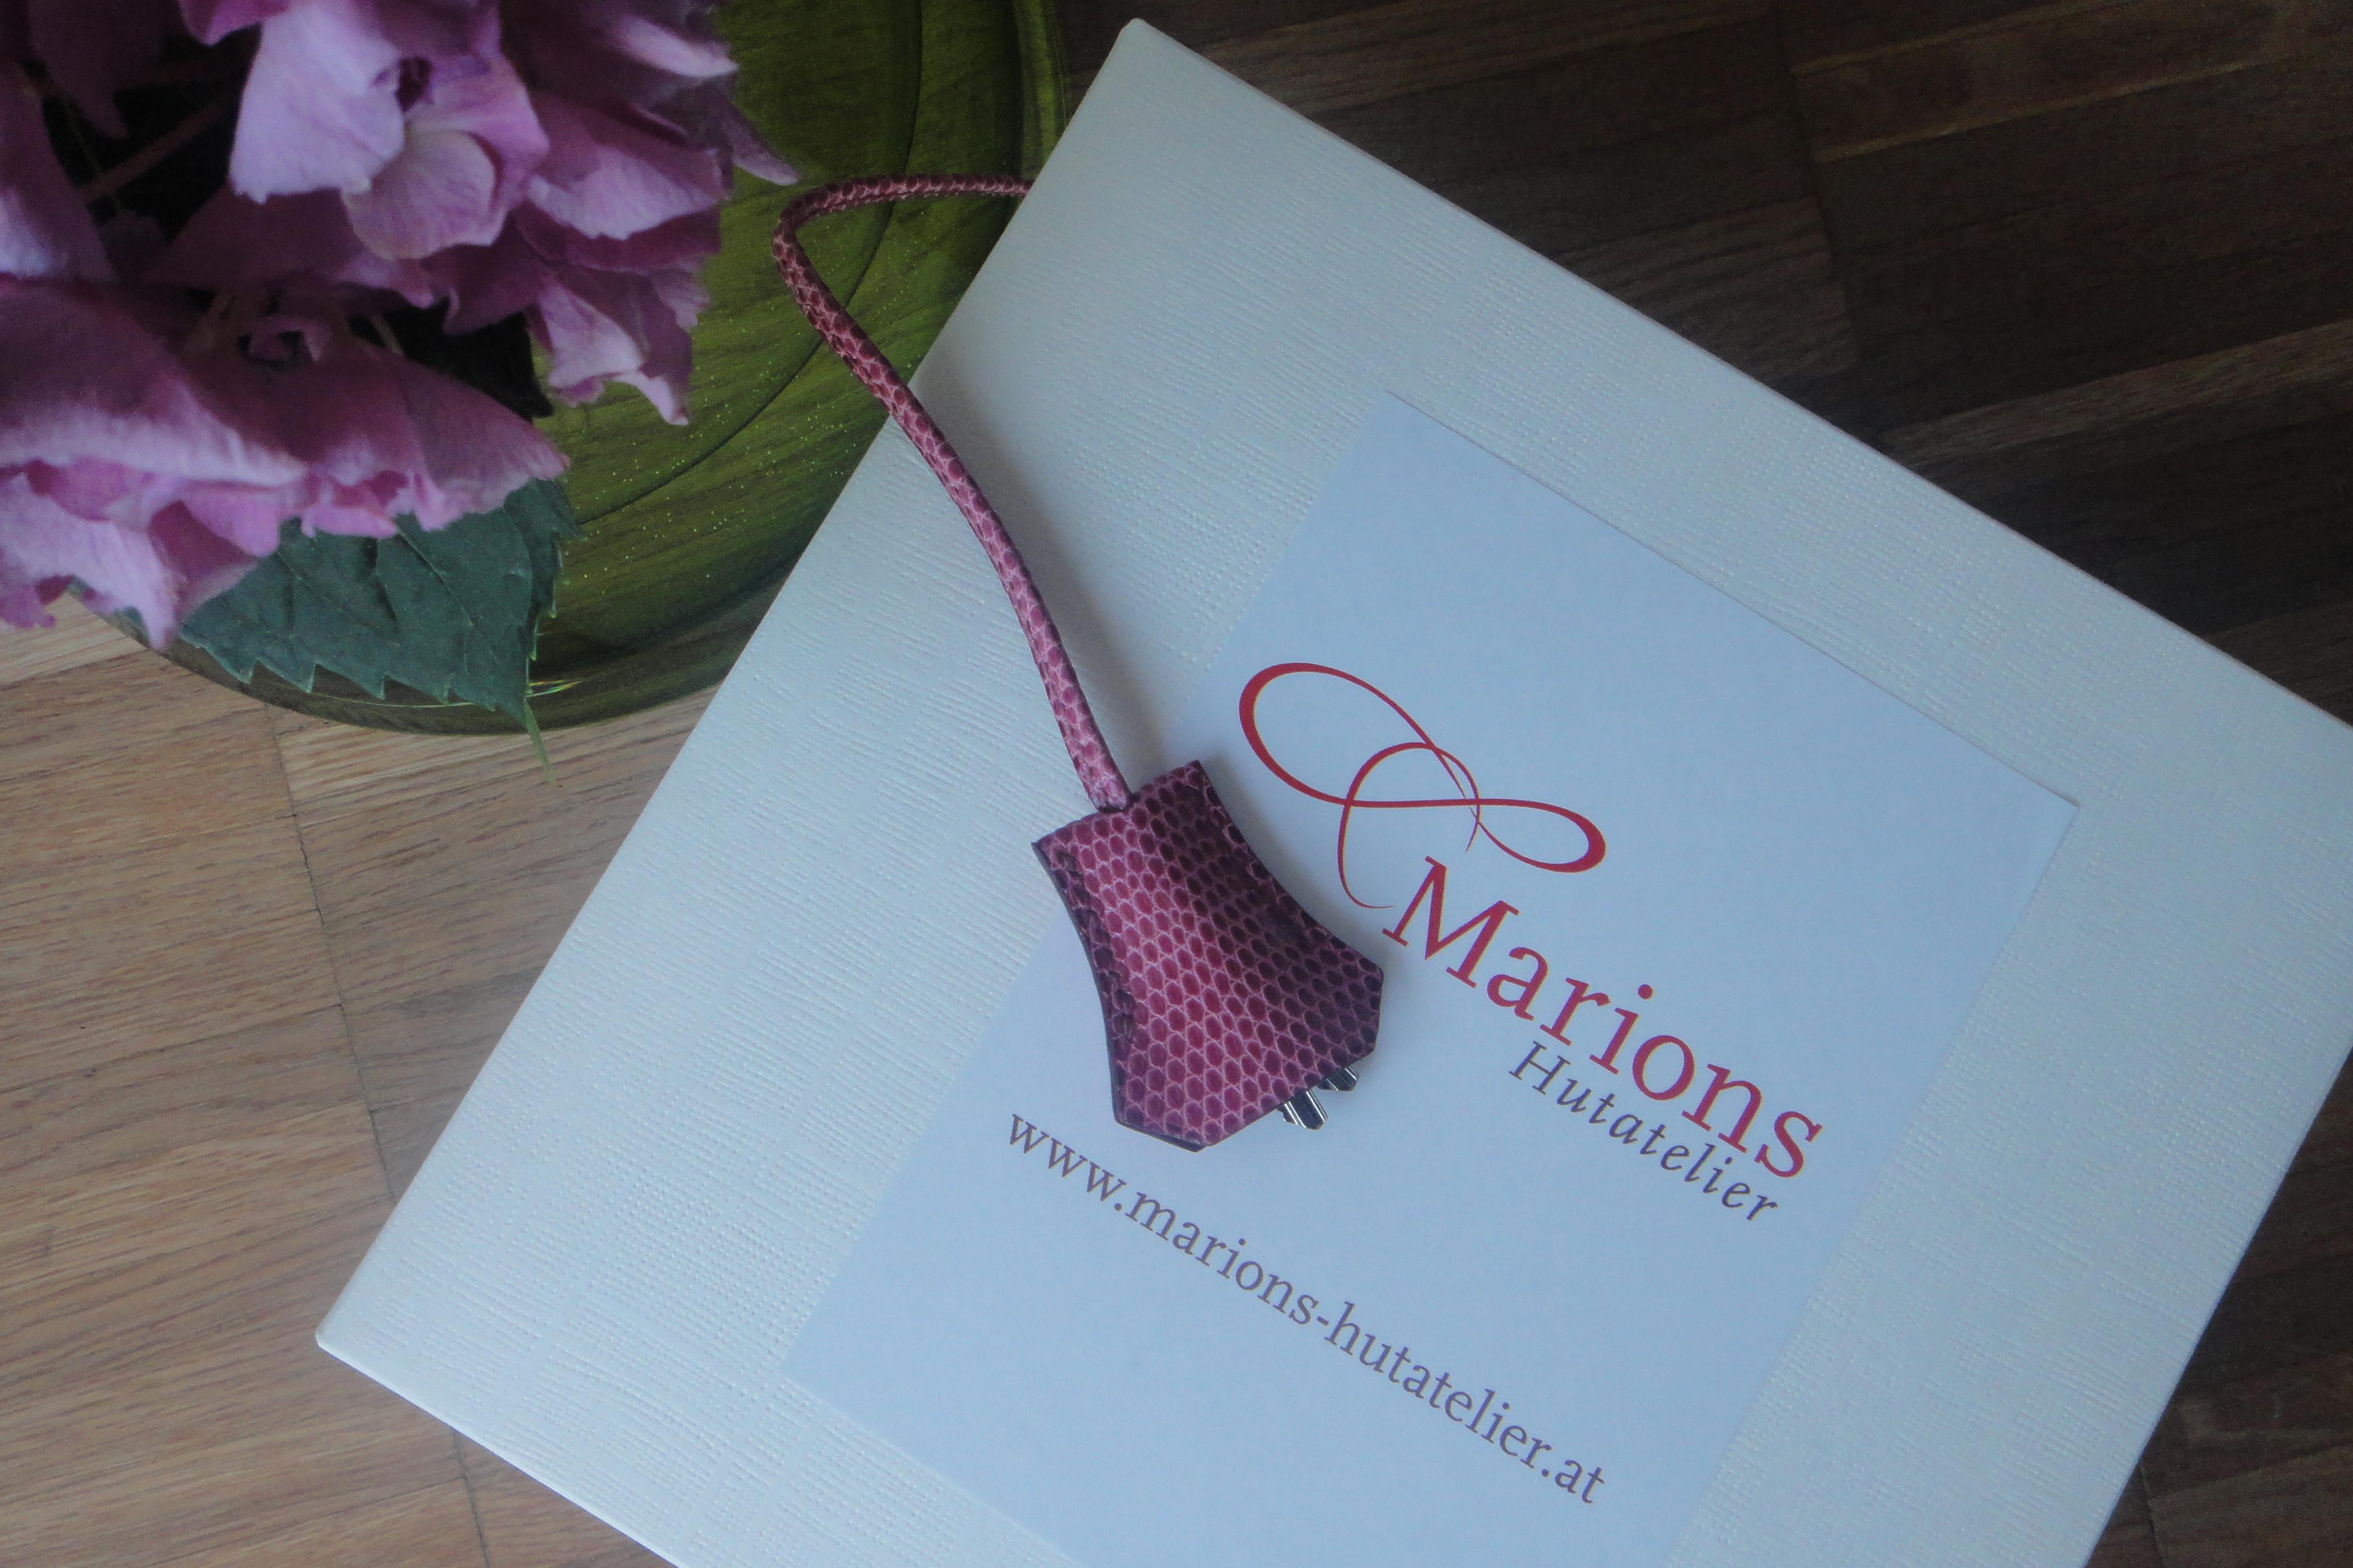 Clochette,  Marions Hutatelier